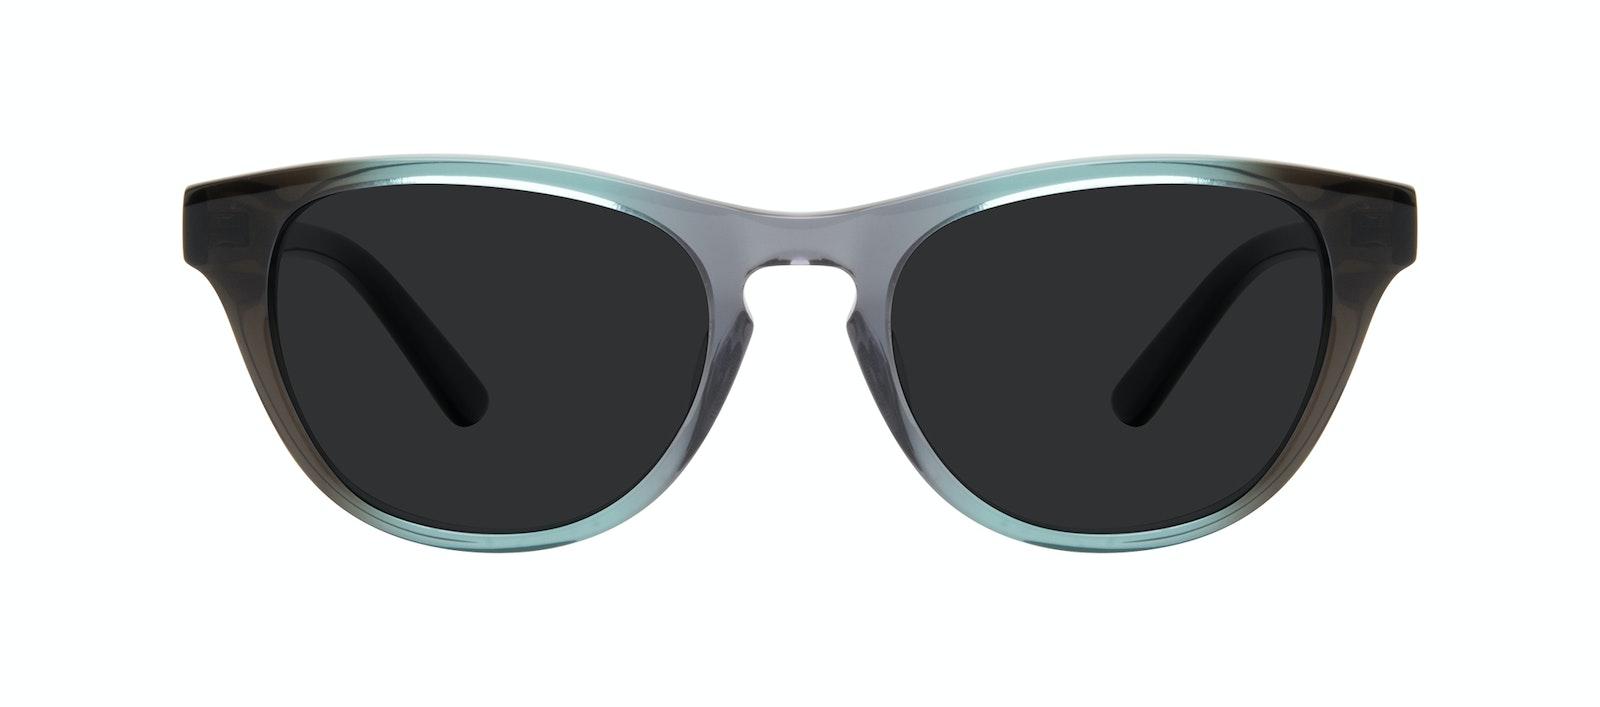 Affordable Fashion Glasses Cat Eye Sunglasses Women Selfie Seafoam Front